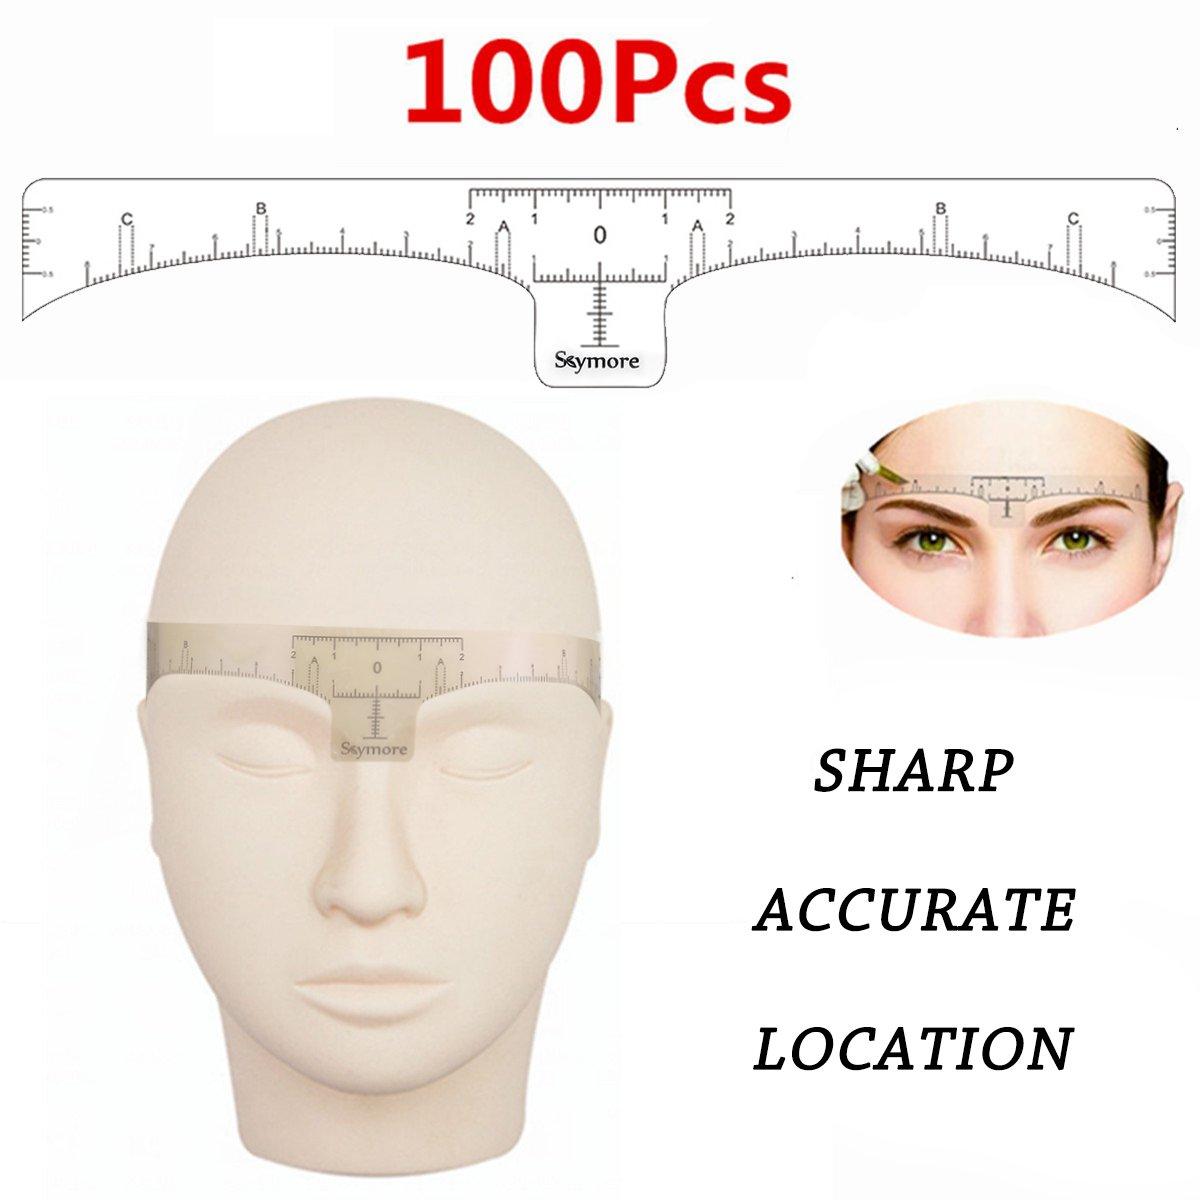 SKYMORE Eyebrow Ruler,100Pcs microblading ruler,Disposable Eyebrow Ruler Sticker, eyebrow ruler for microblading supplies